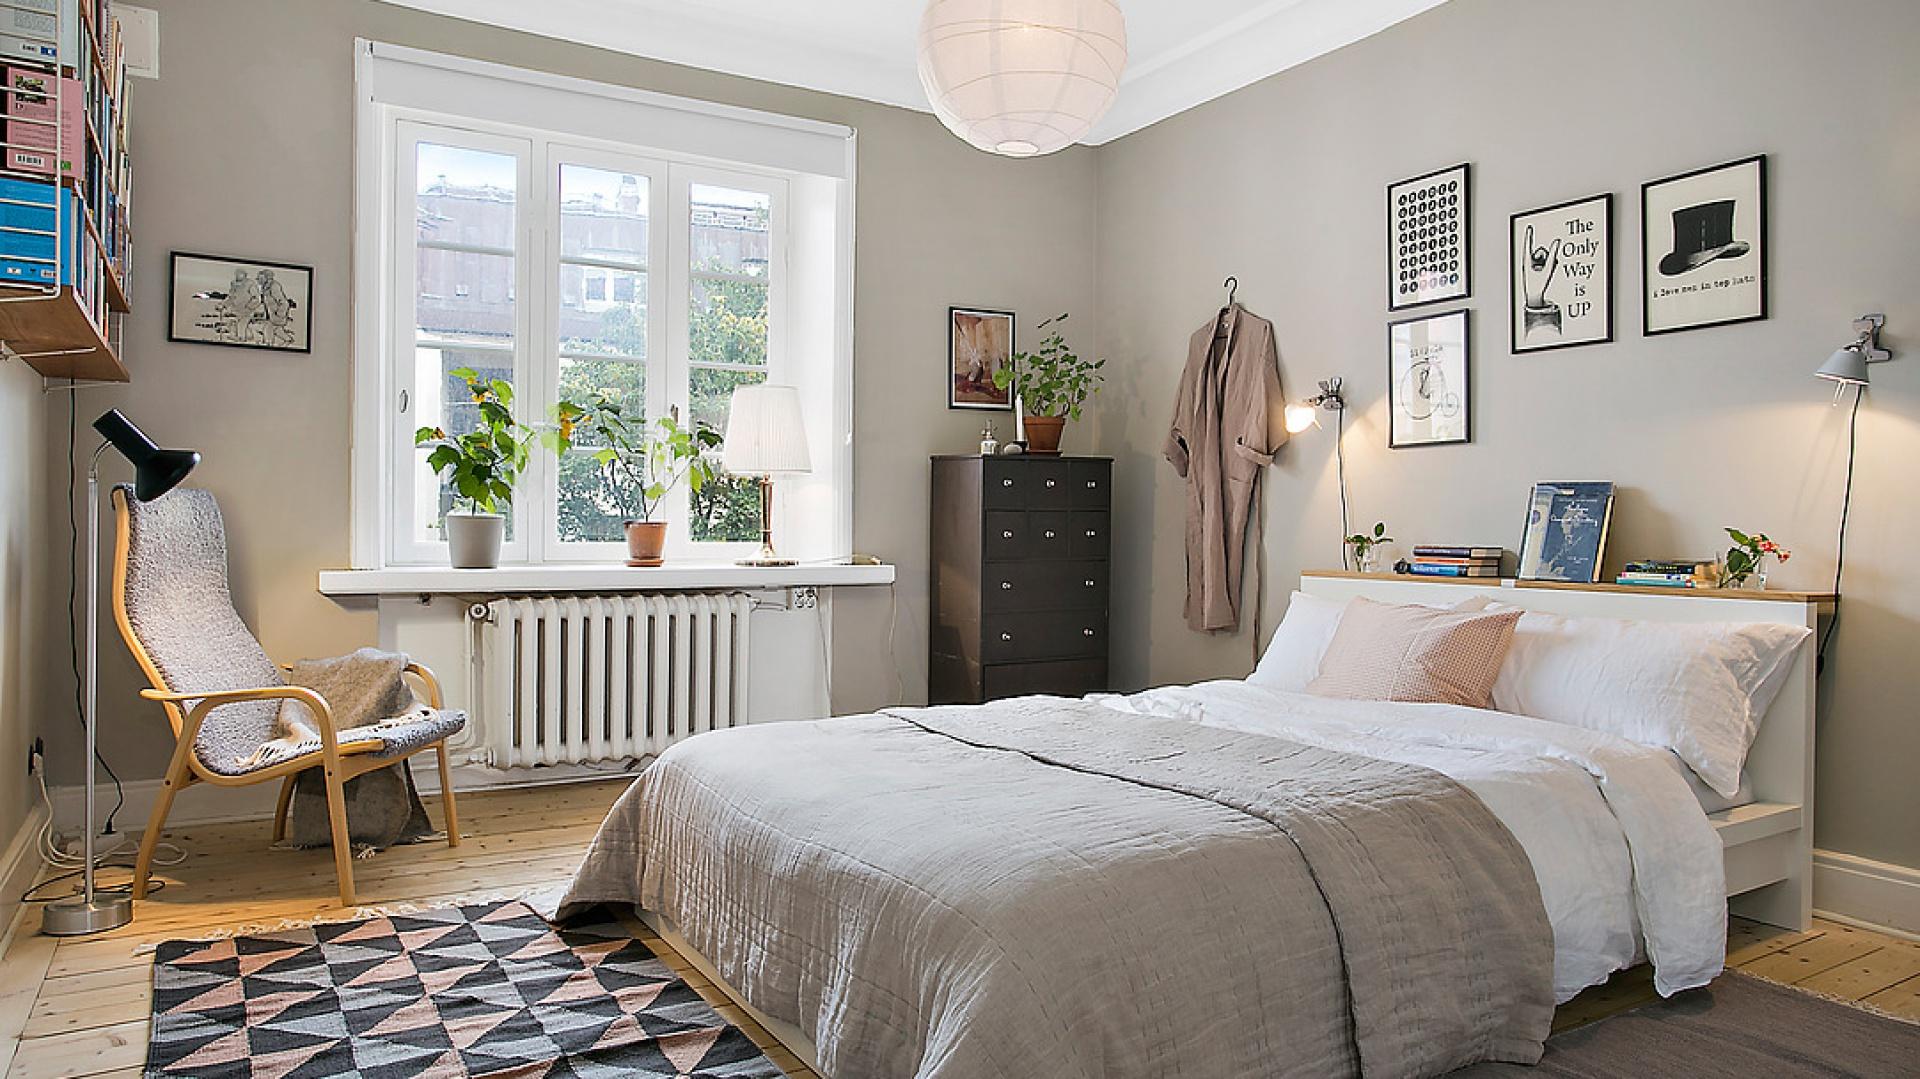 sypialnia w stylu szare ciany pomys na aran acj sypialni. Black Bedroom Furniture Sets. Home Design Ideas